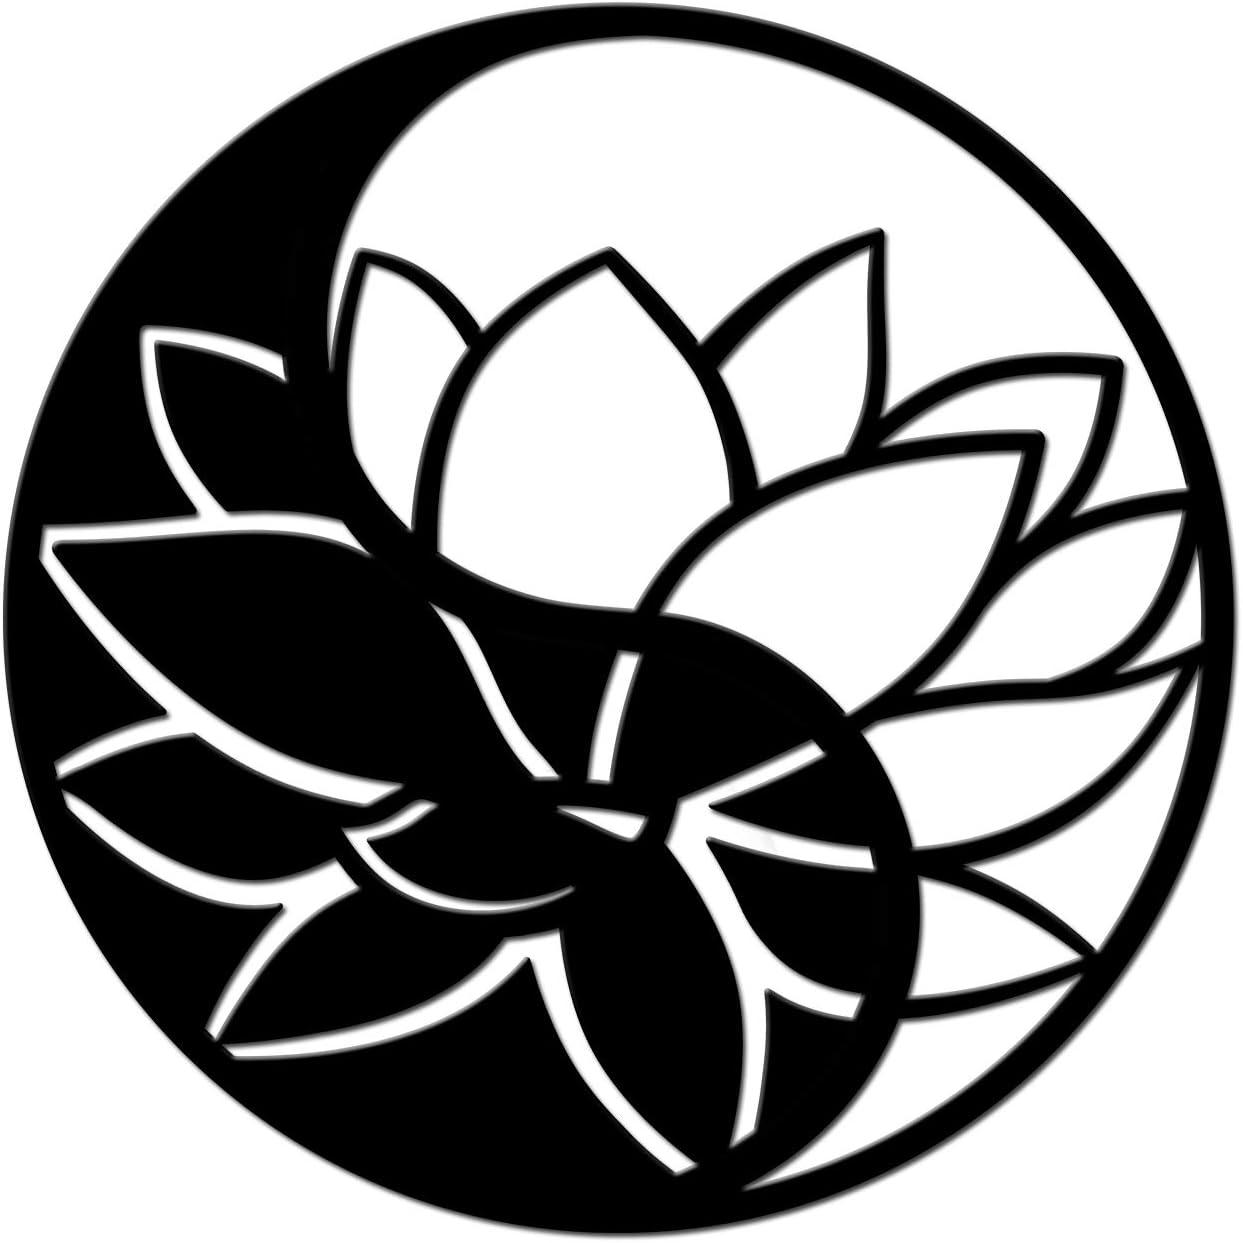 Artmyharbor Lotus Flower of Life Metal Wall Art Yin Yang Decor Yoga Symbol Metal Wall Sculpture Decorative Meditation Yoga Hanging Artwork Home Bedroom Bathroom Wall Decoration